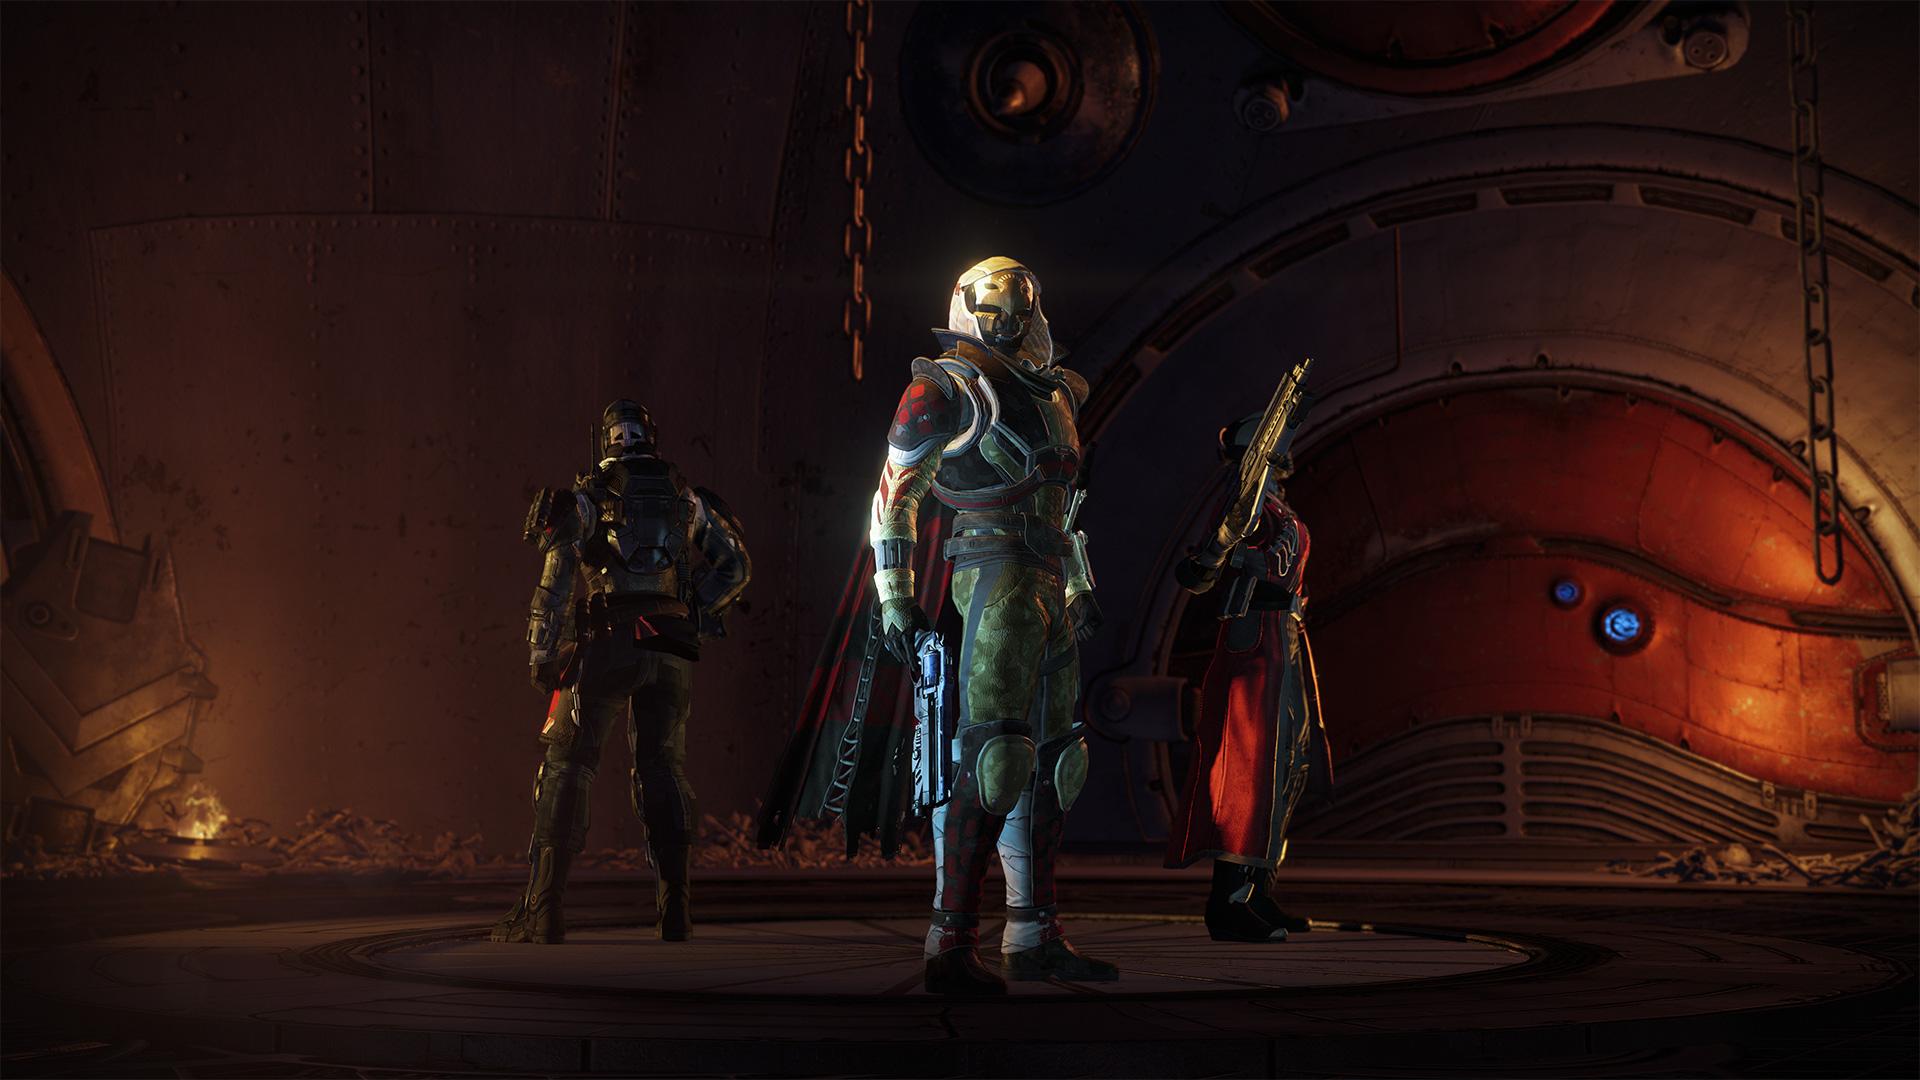 Destiny Prison of Elders Screen 2